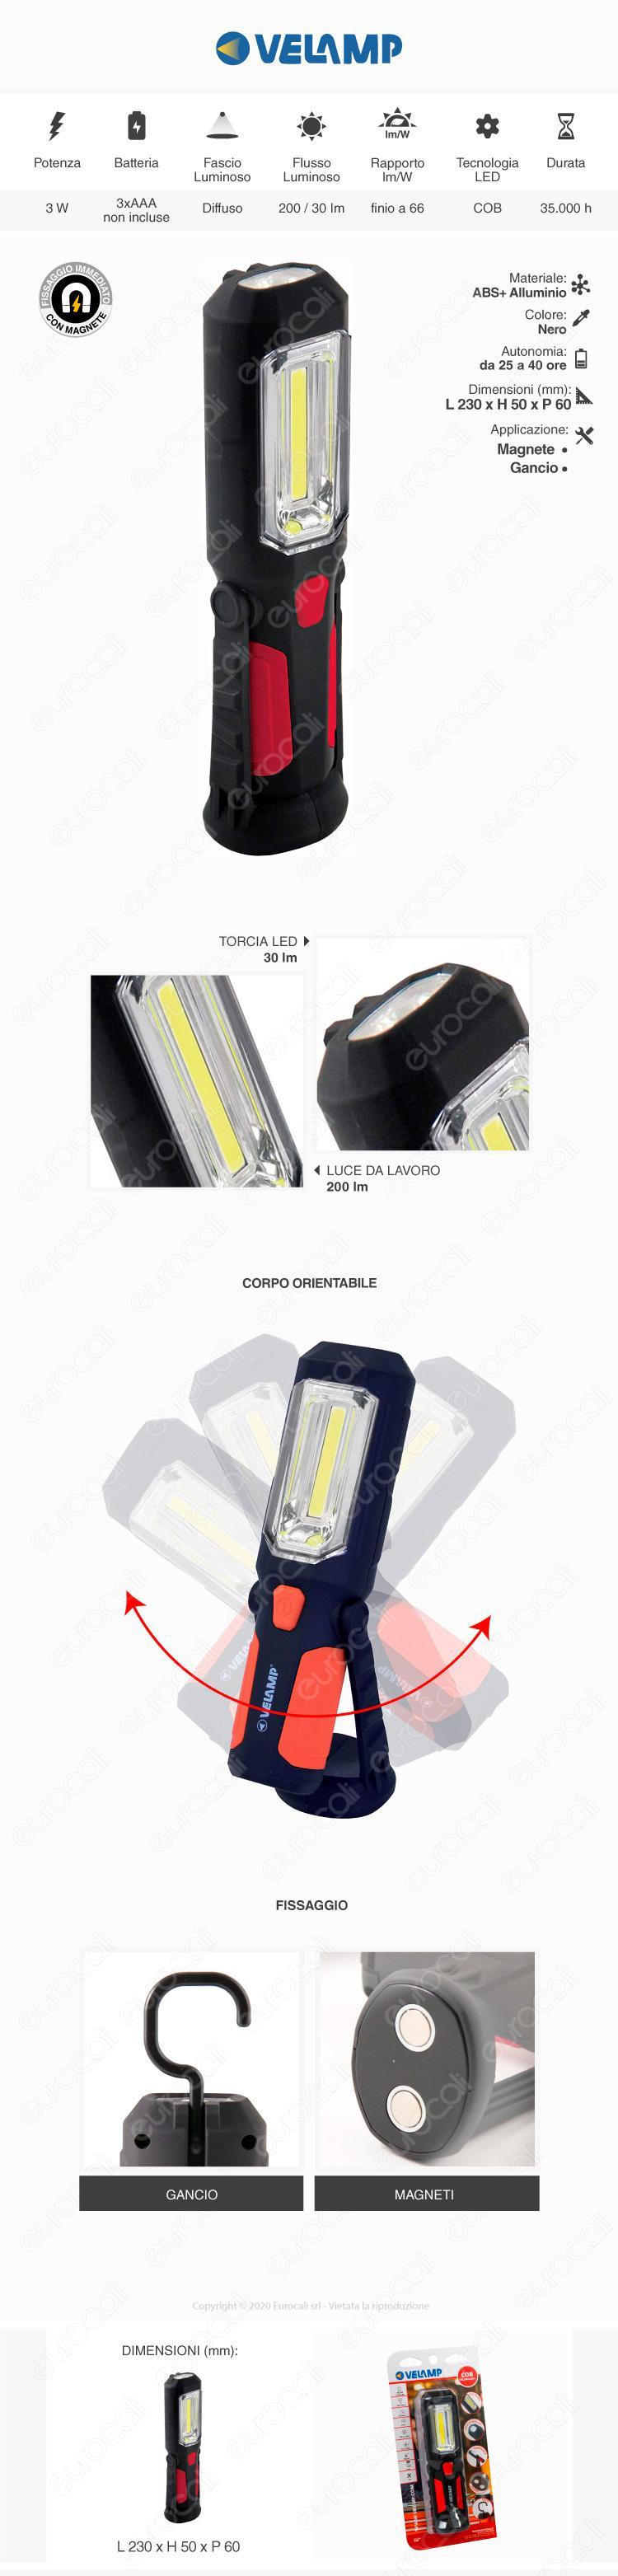 velamp lampada da lavoro